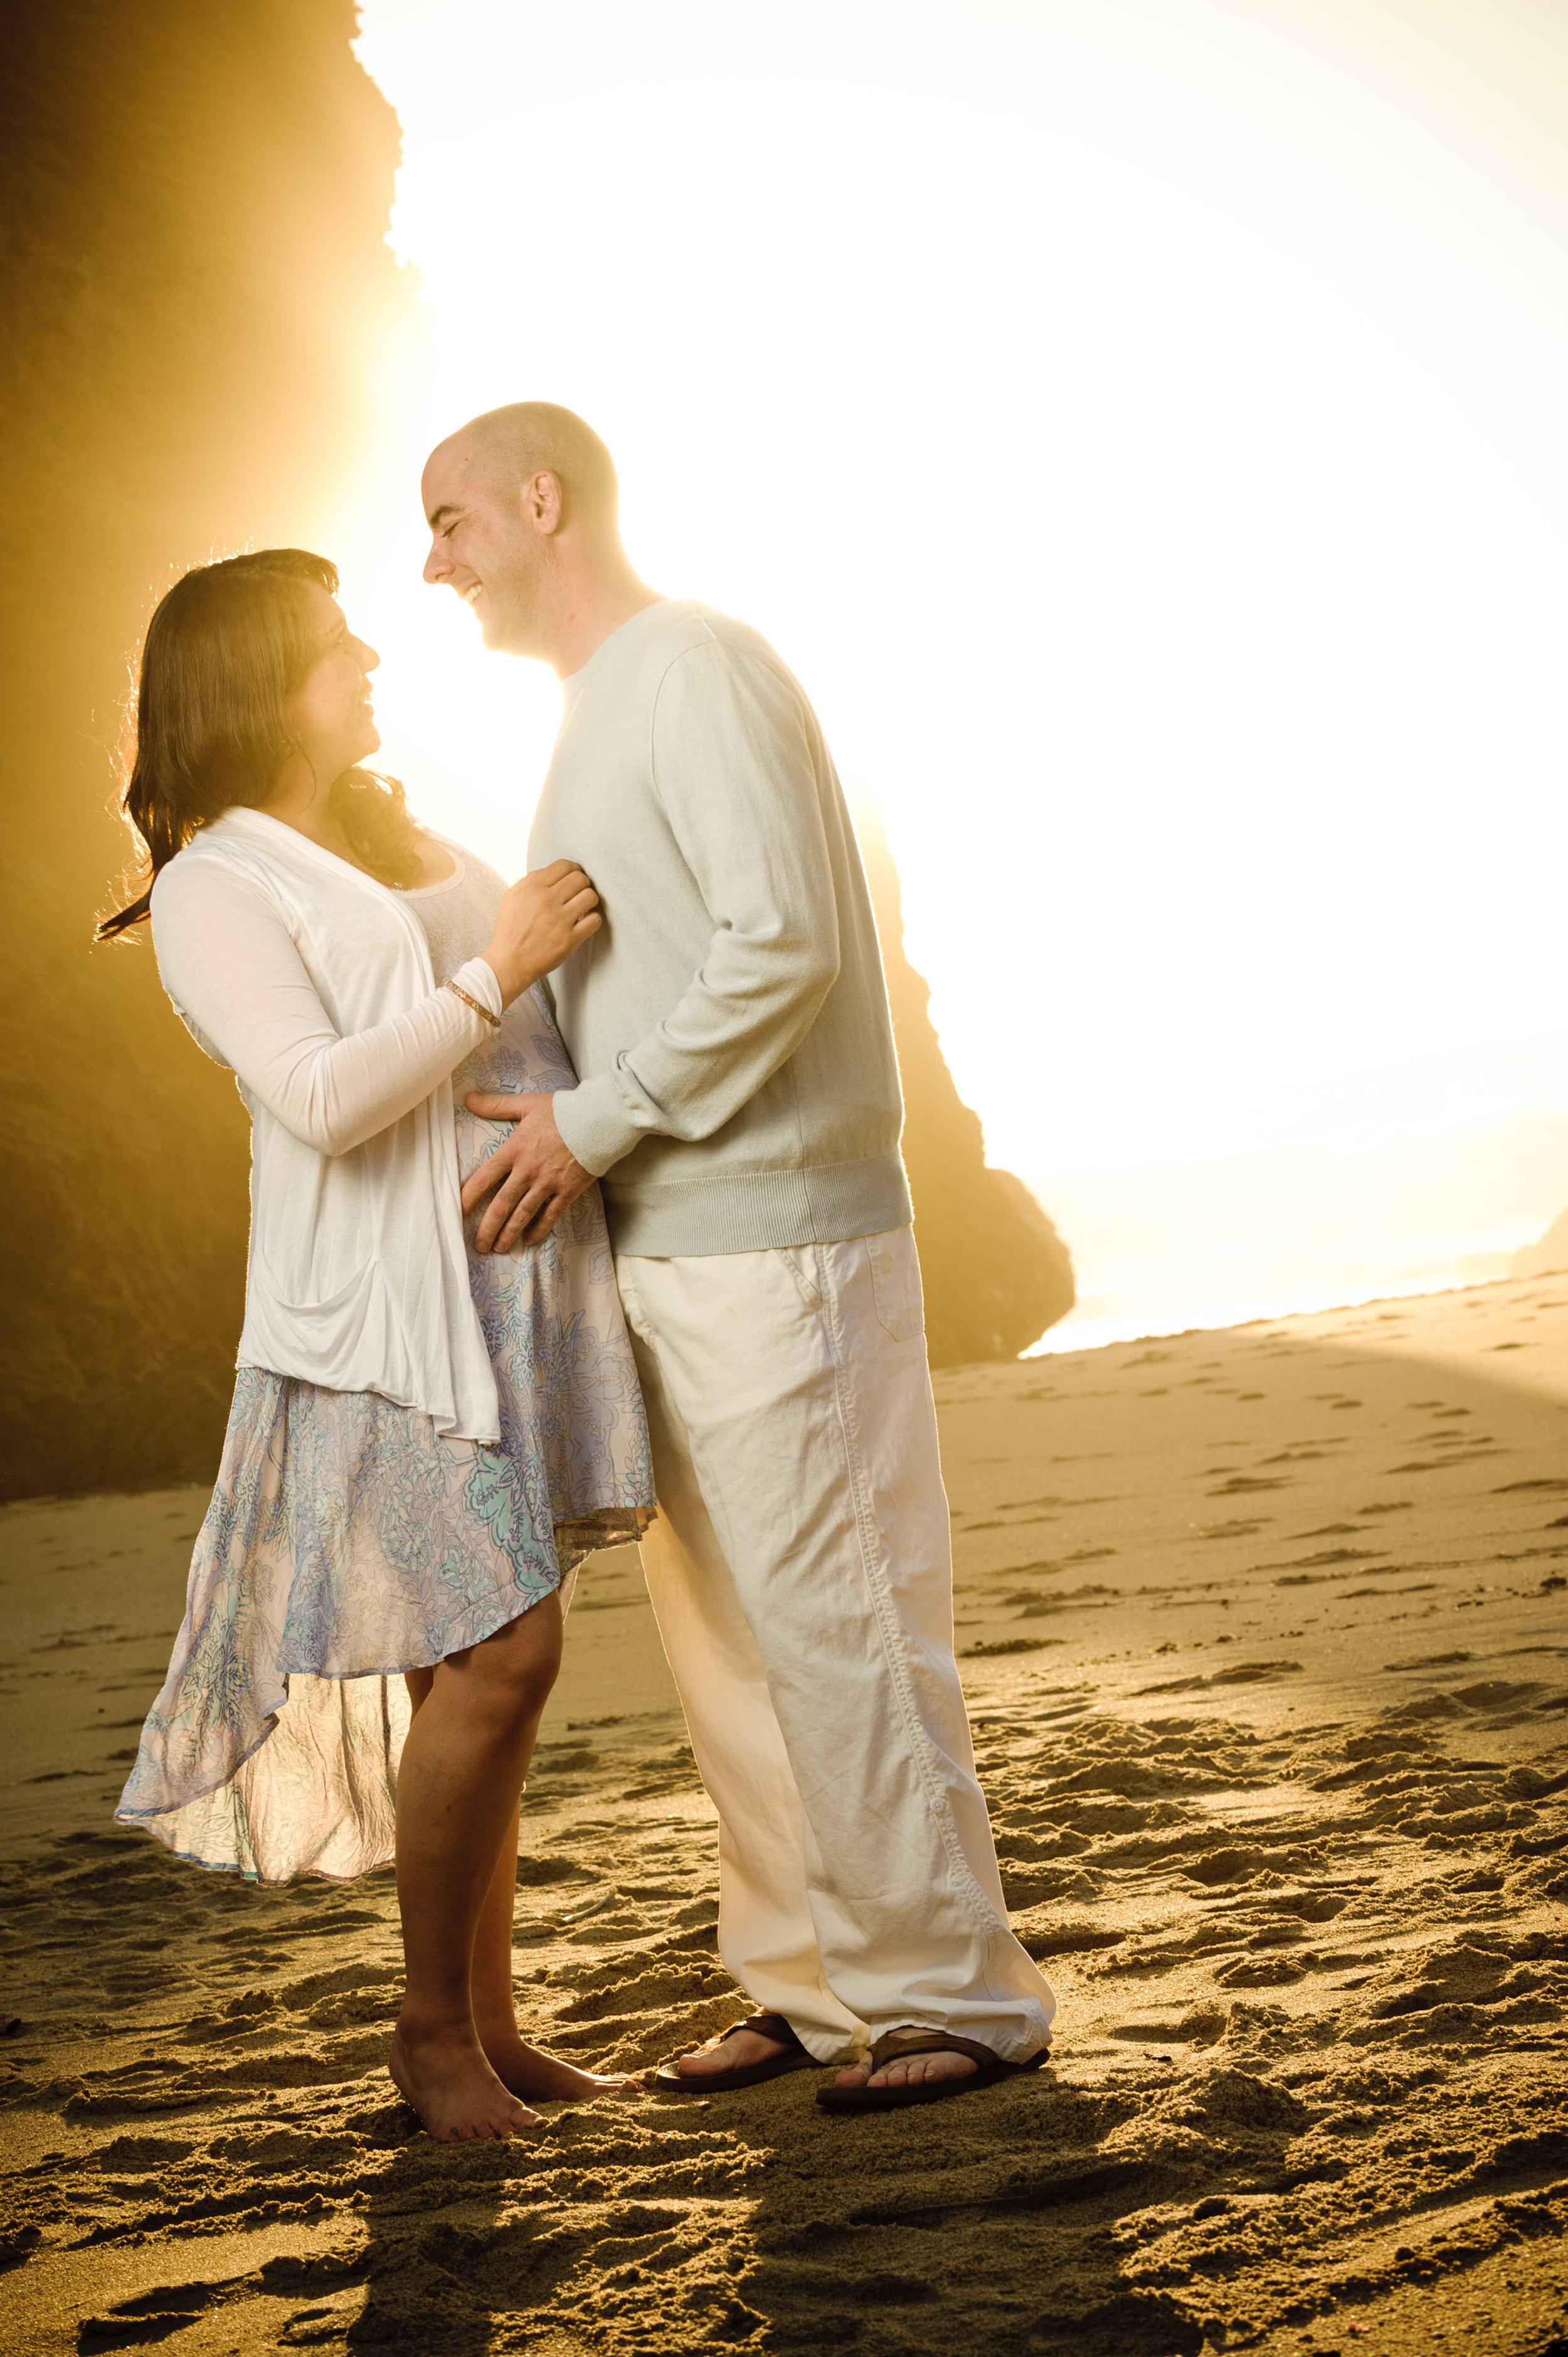 d3_Kim_and_Jon_Santa_Cruz_Maternity_Photography_Panther_Beach-7892.jpg